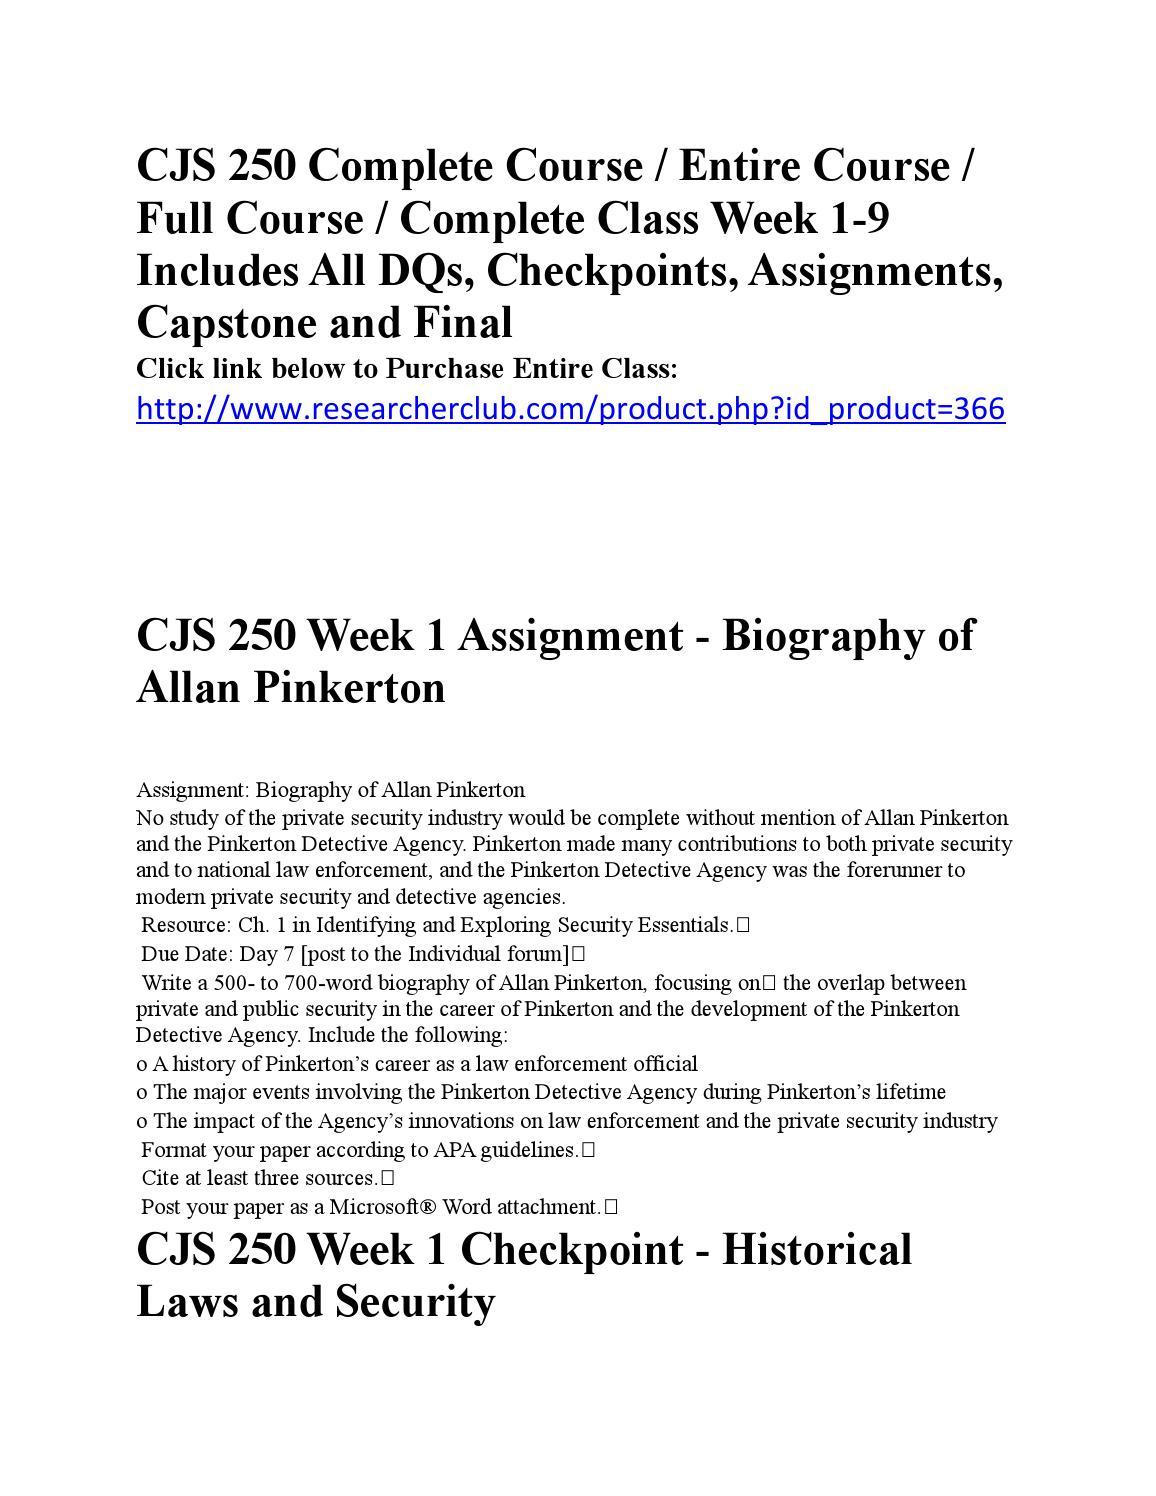 cjs250 allan pinkerton Cjs 250 week 9-final project techy of fortune october 30 cjs 250 week 1-assignment - biography of allan pinkerton general questions general academic.